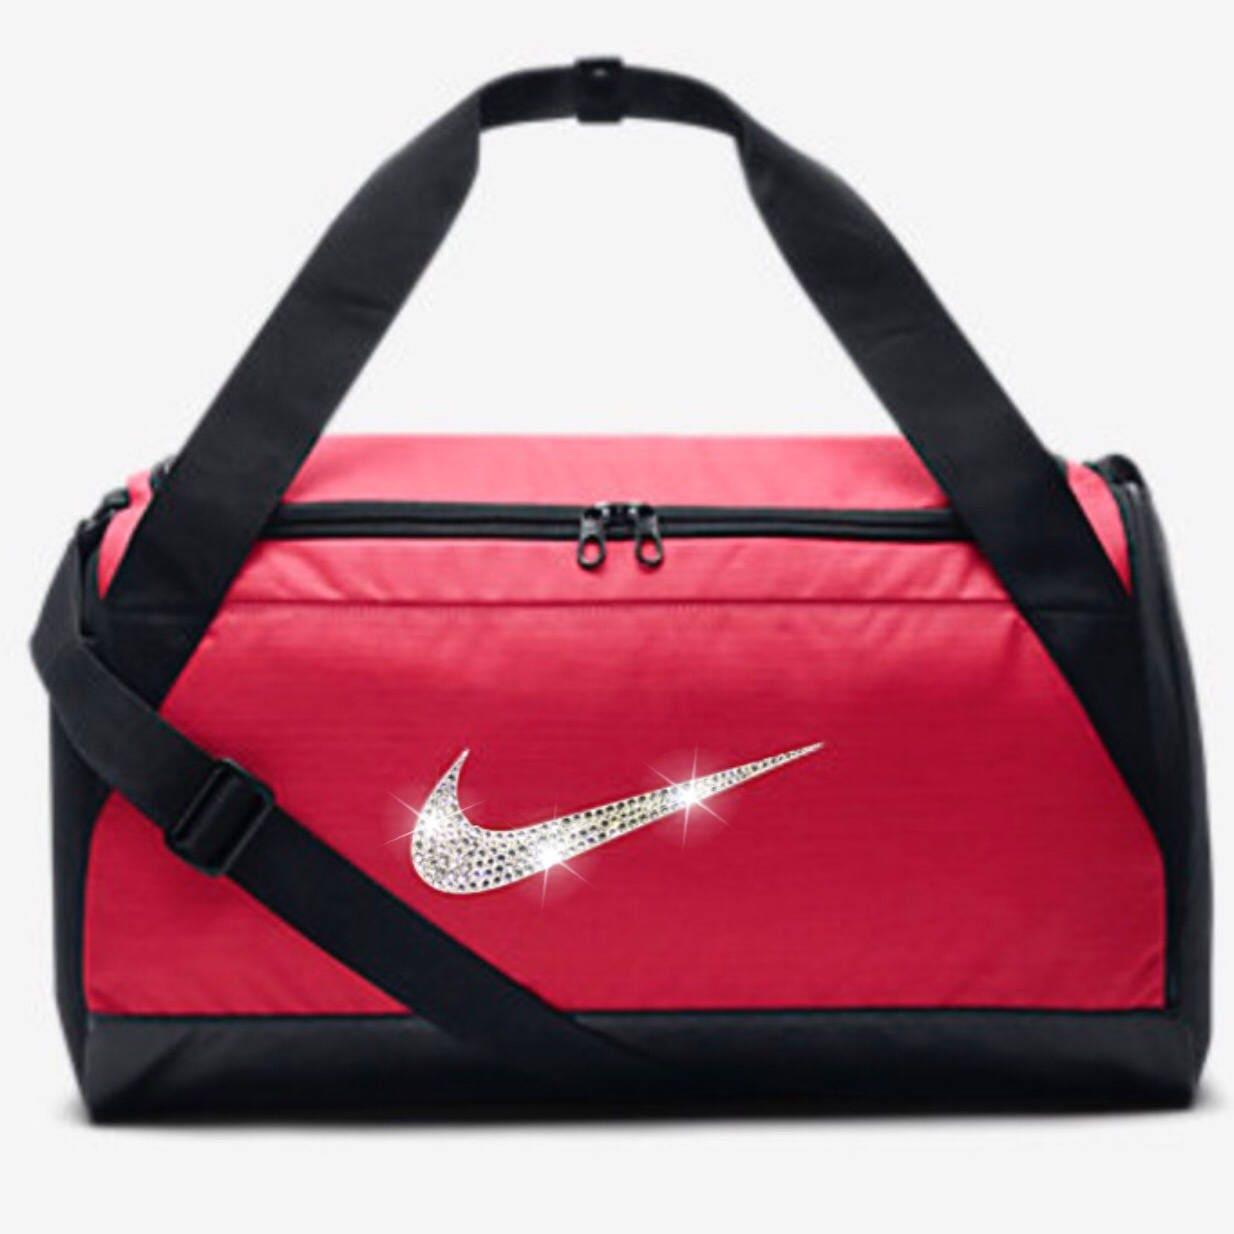 71f0a53436c9 Bling Nike Brasilia Gym Bag with Swarovski Crystal Bedazzled